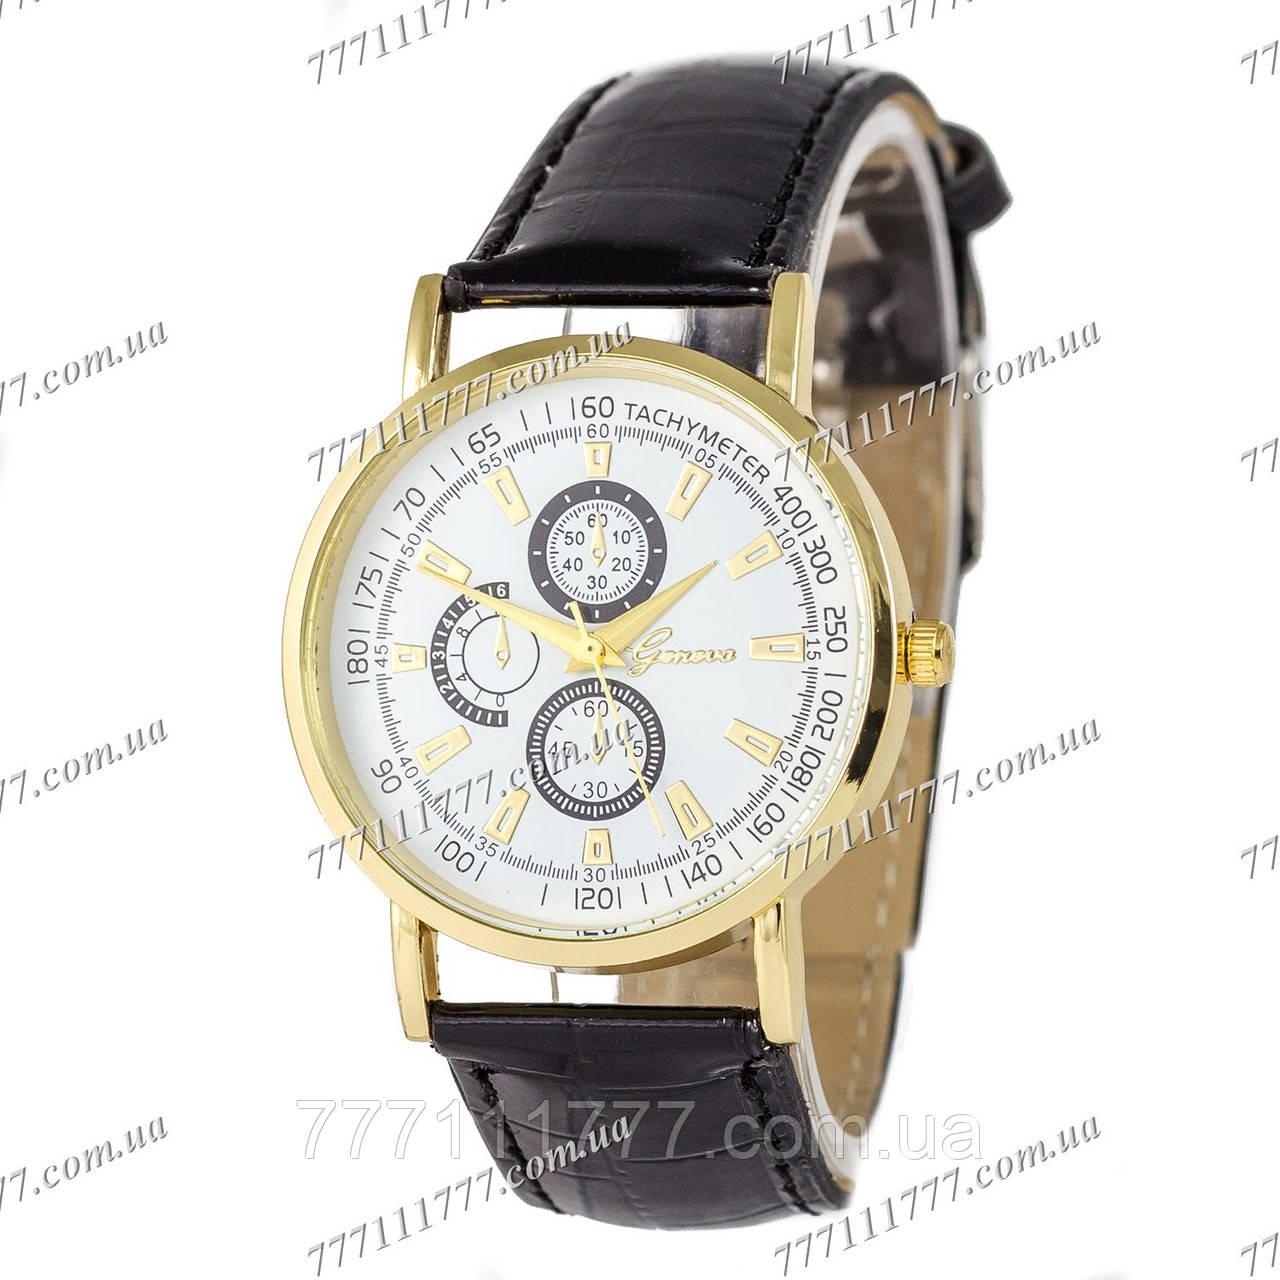 Часы наручные женева цена часы наручные мужские касио ж шок